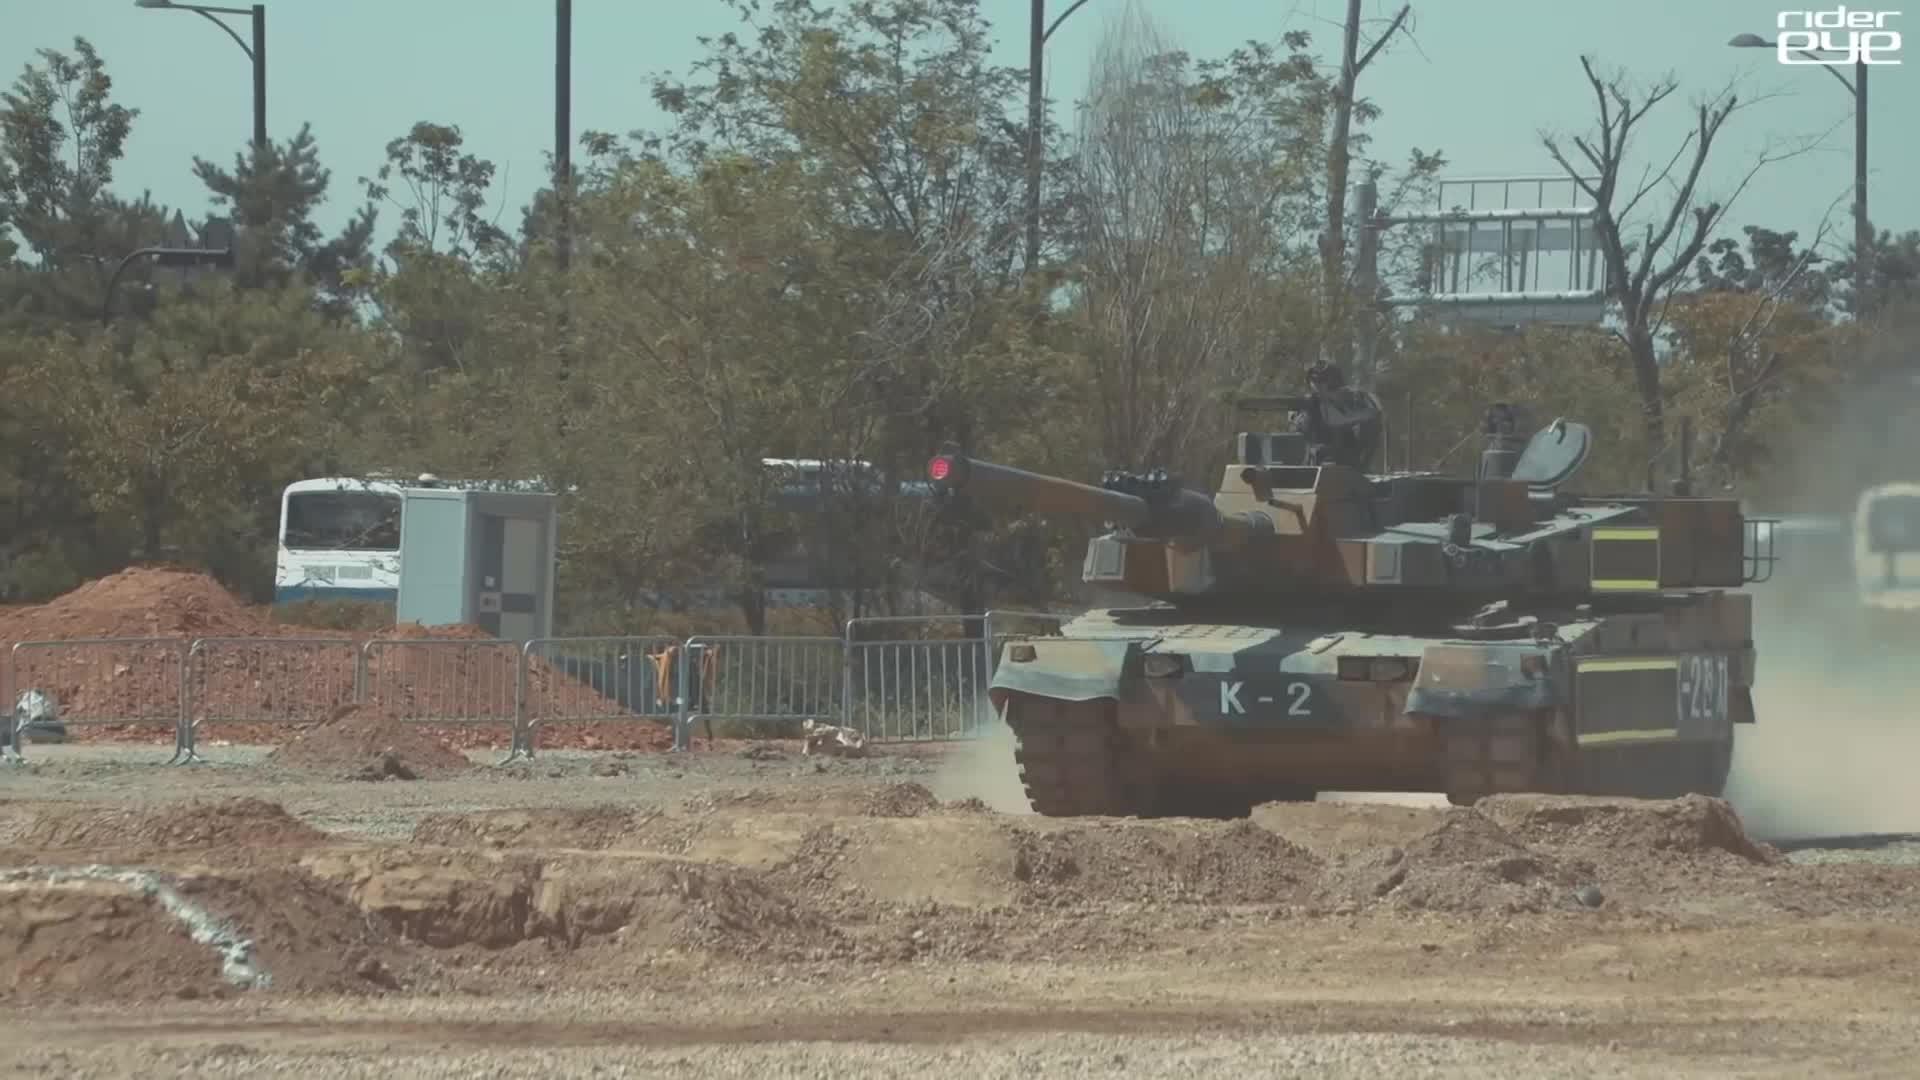 korea, military, militarygfys, south korea, K2 Black Panther mobility demo GIFs